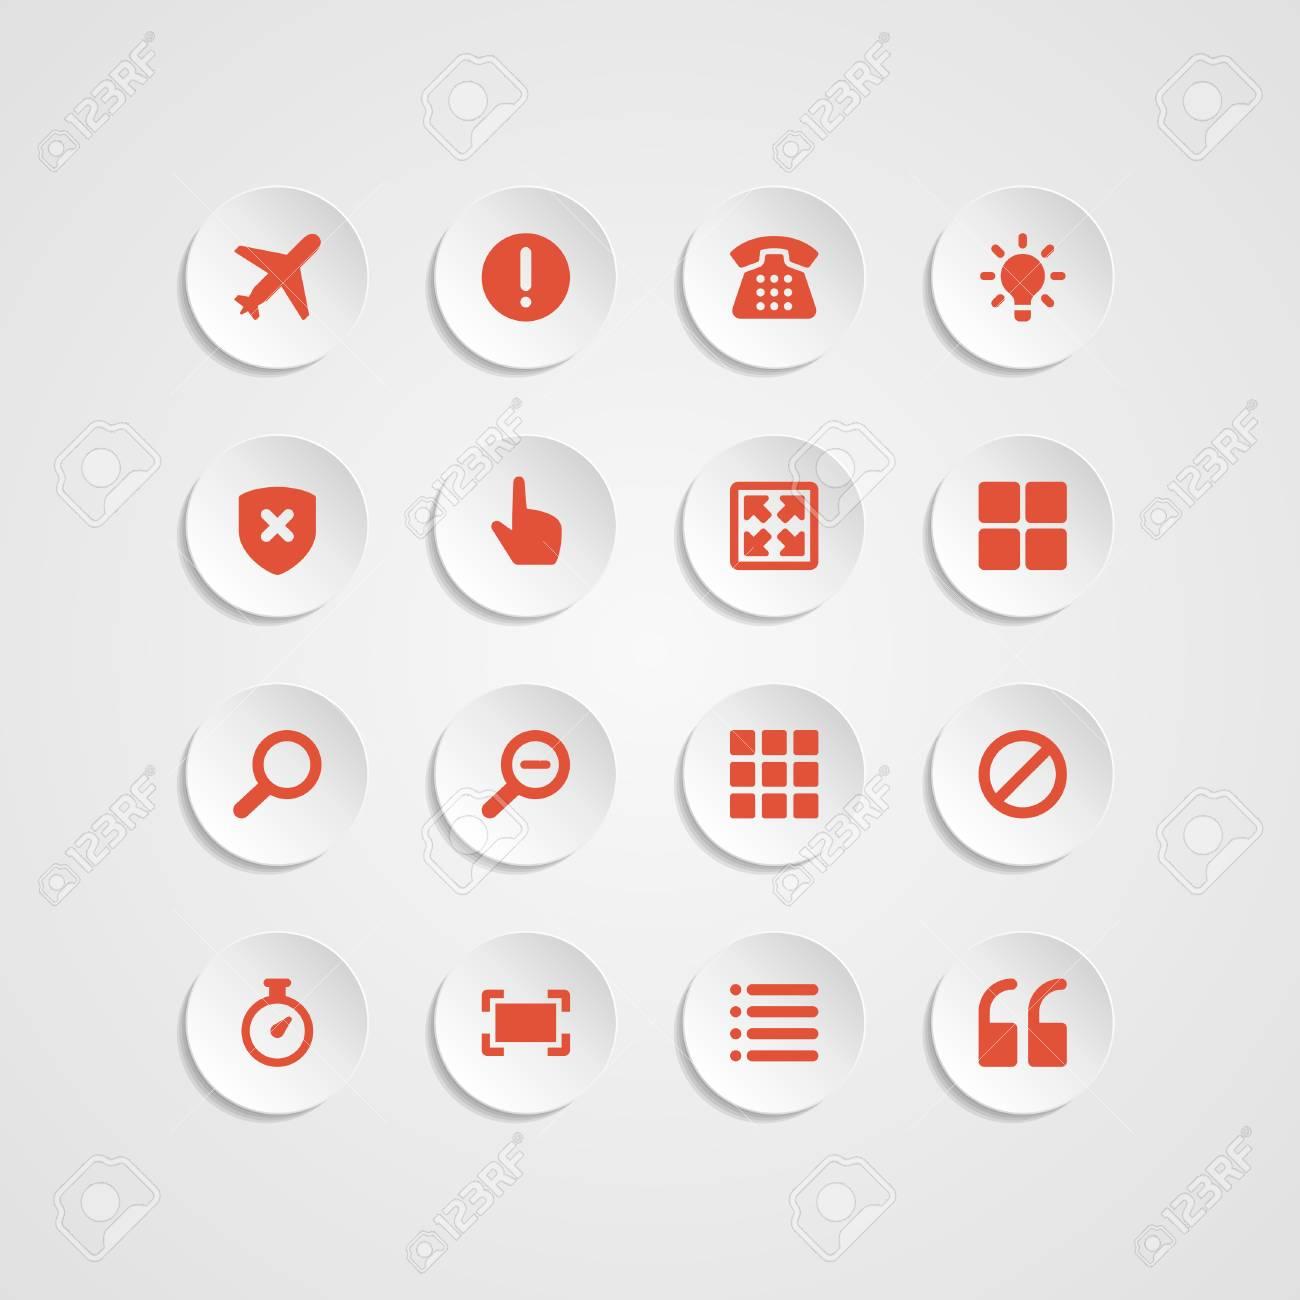 Web site vector icons set bend paper effect  Vector design elements for design Stock Vector - 25438179